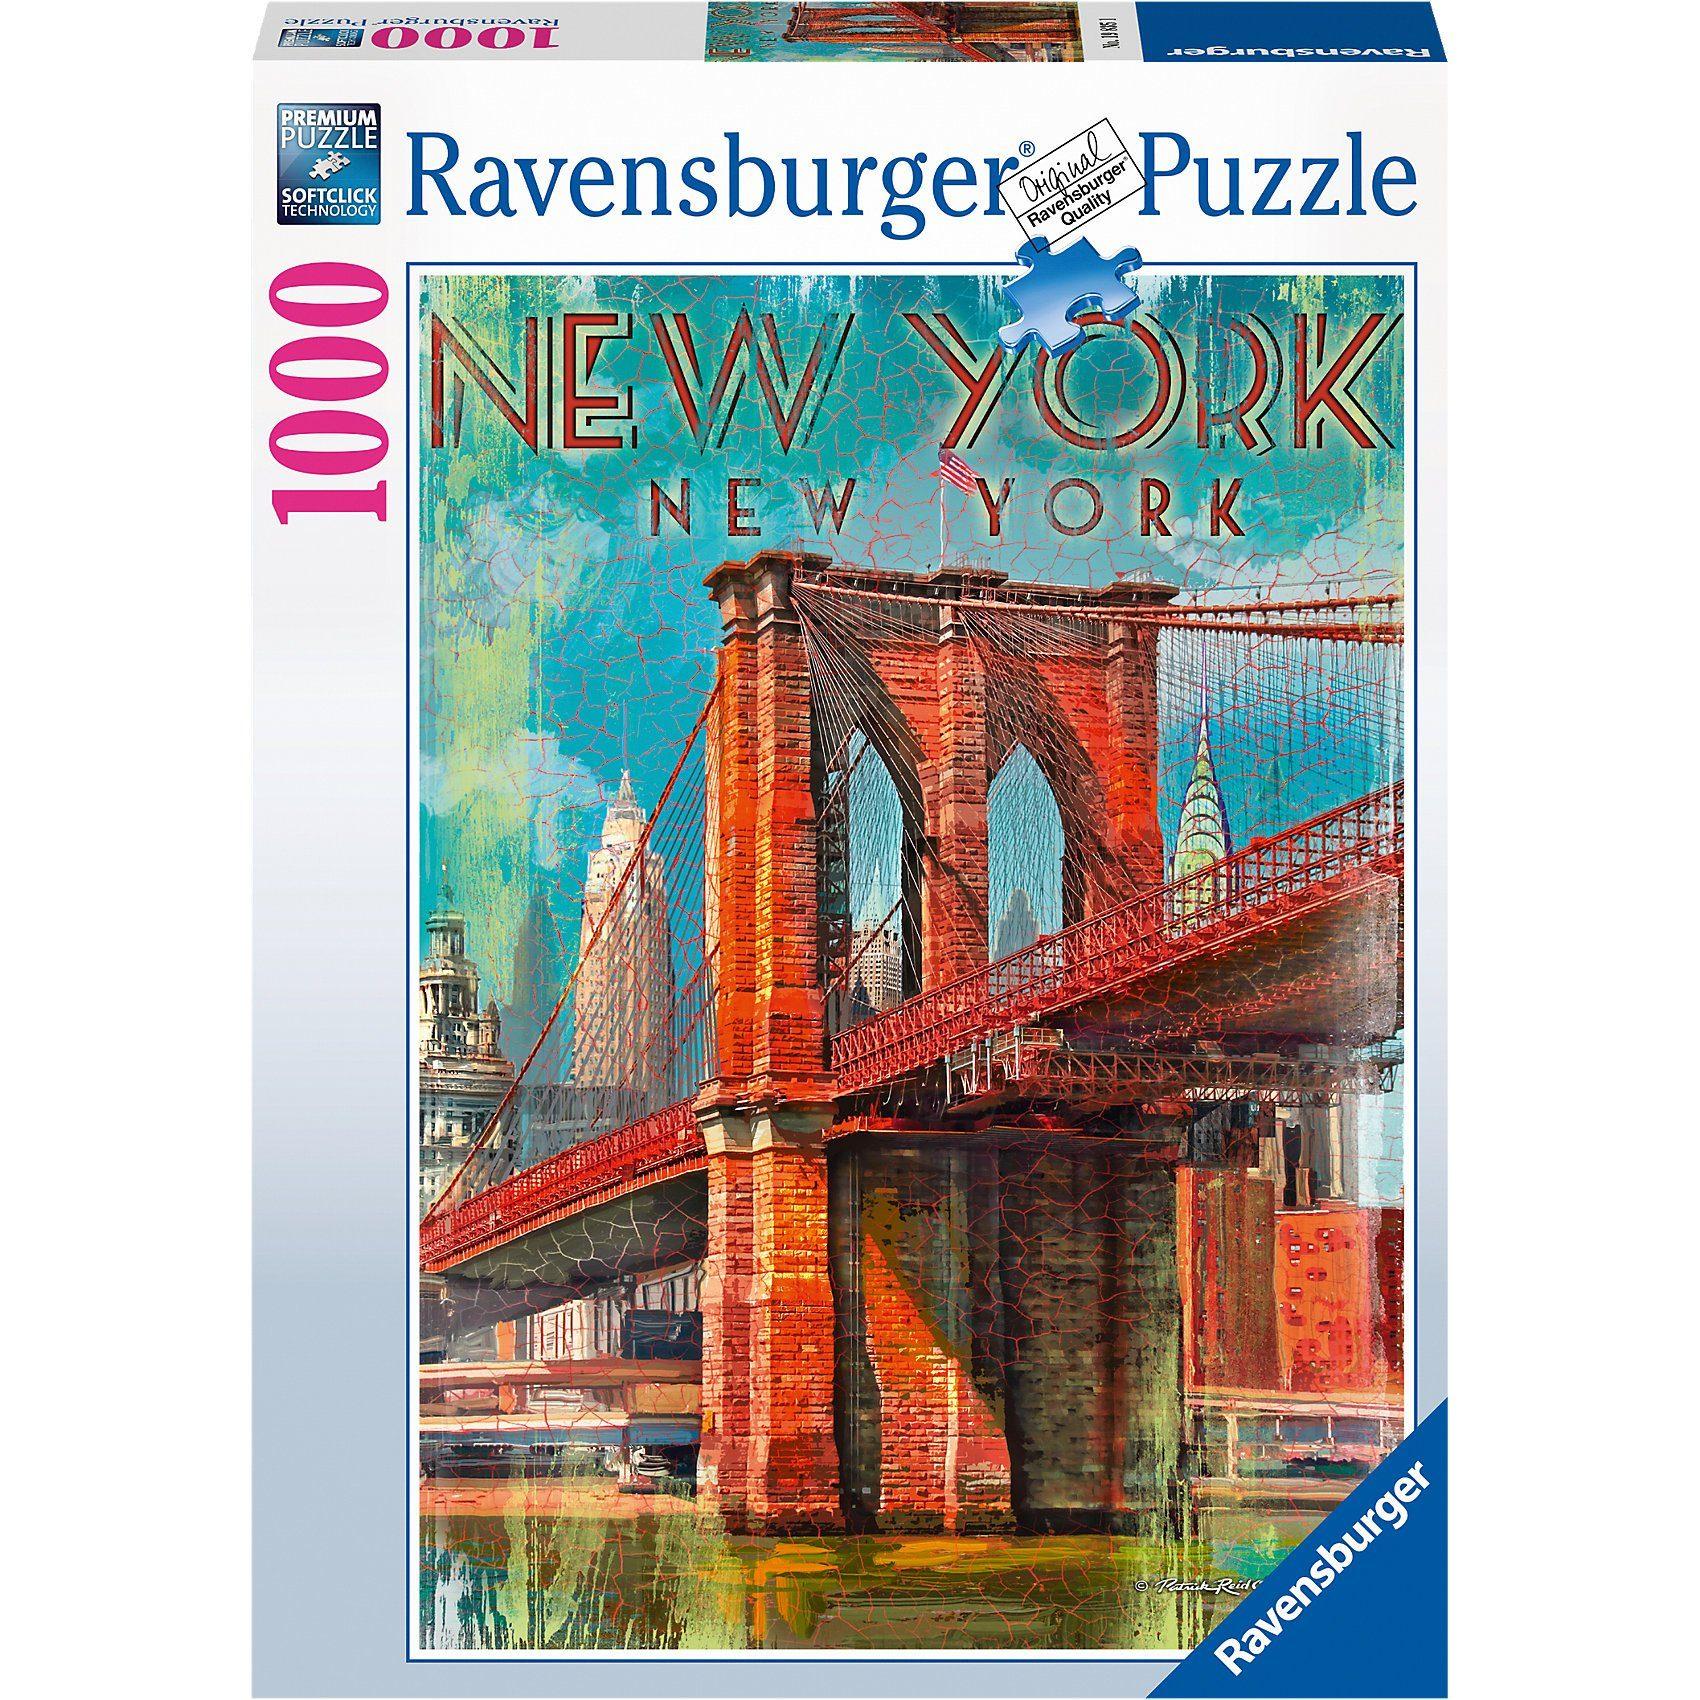 Ravensburger Puzzle 1000 Teile Retro New York